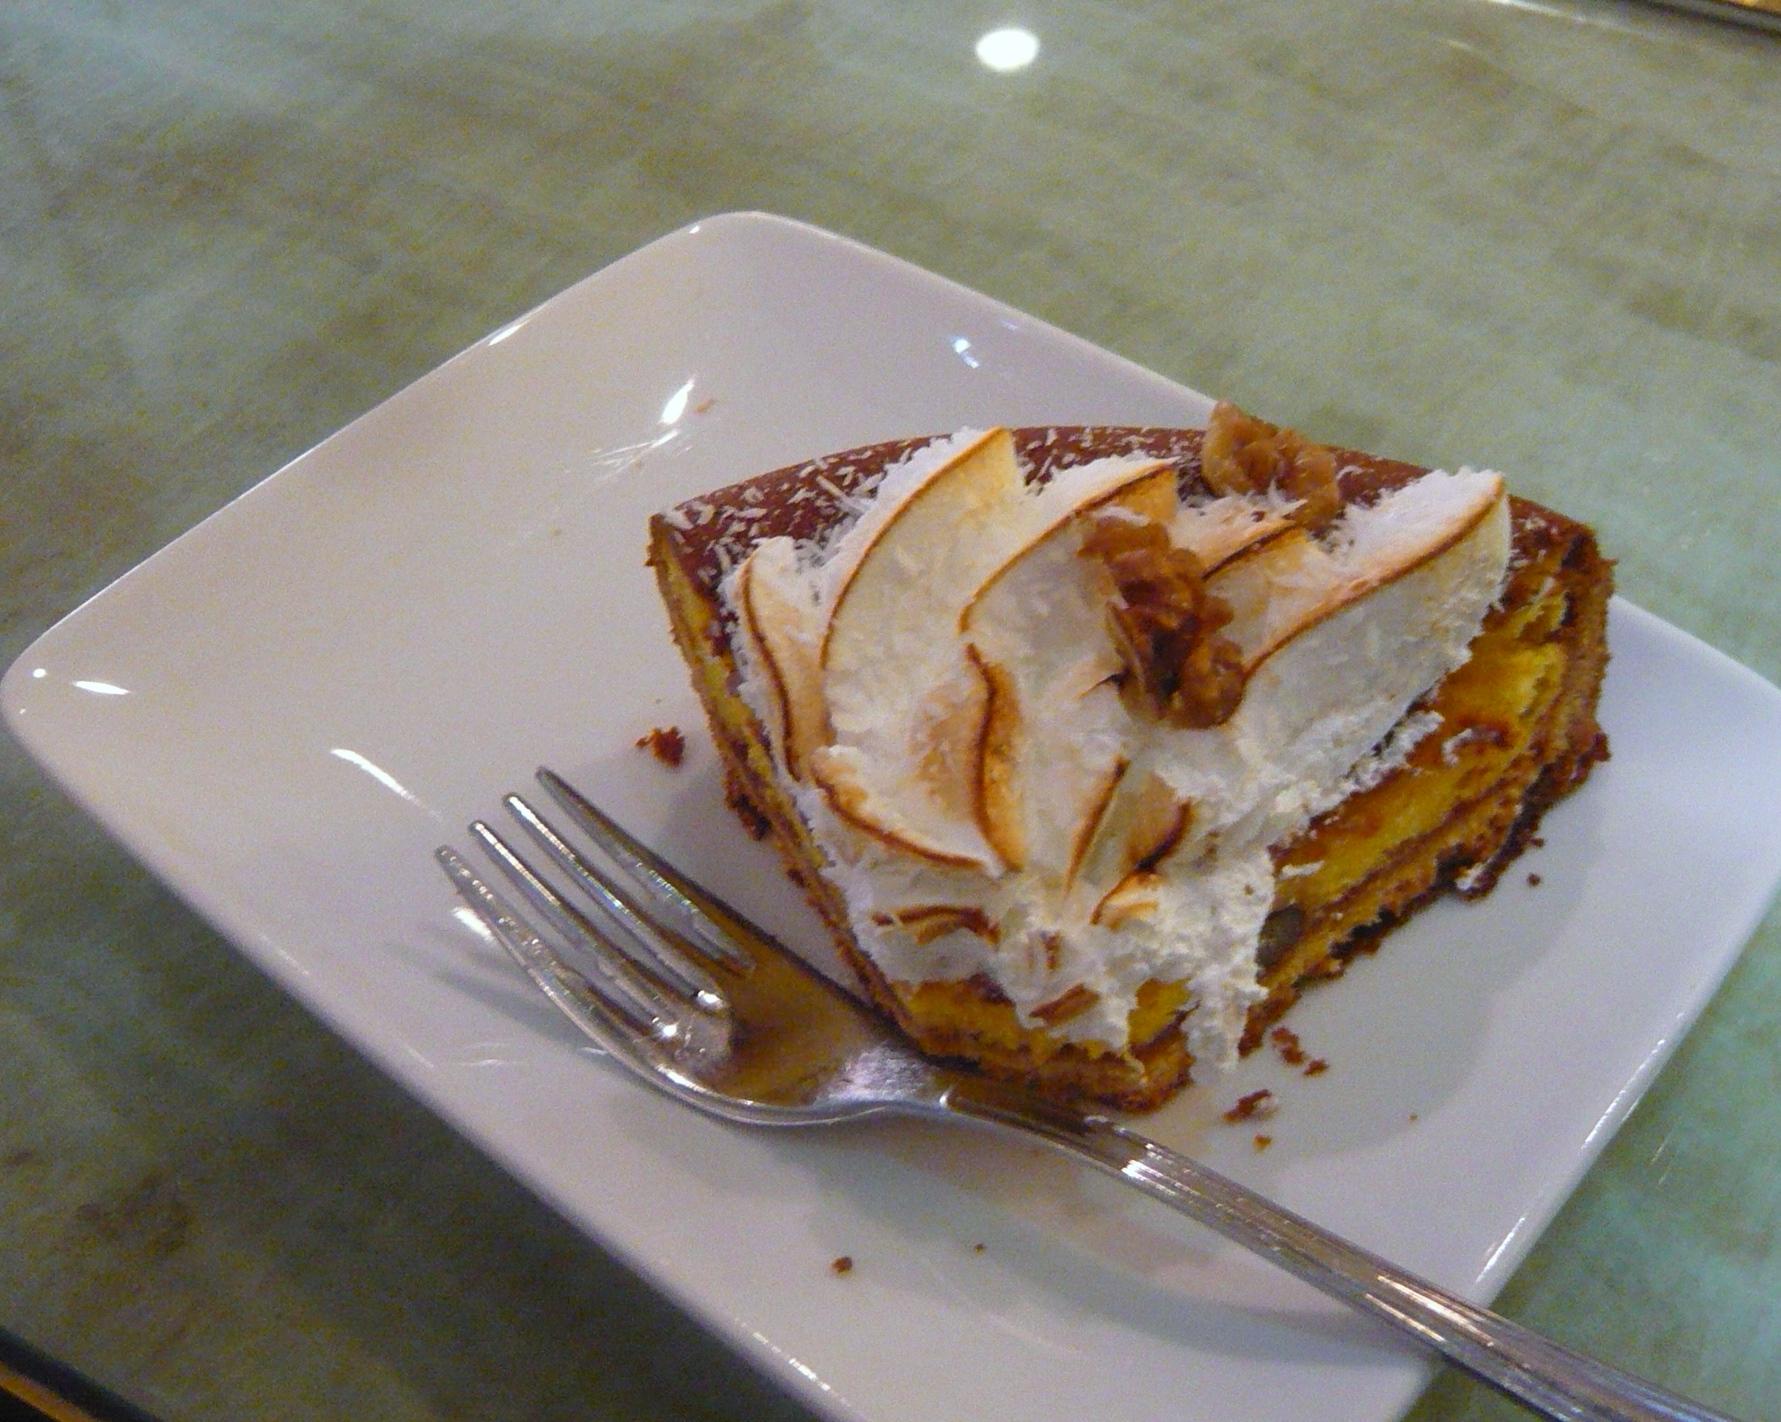 woolrich spaccio aziendale bologna cake - photo#40